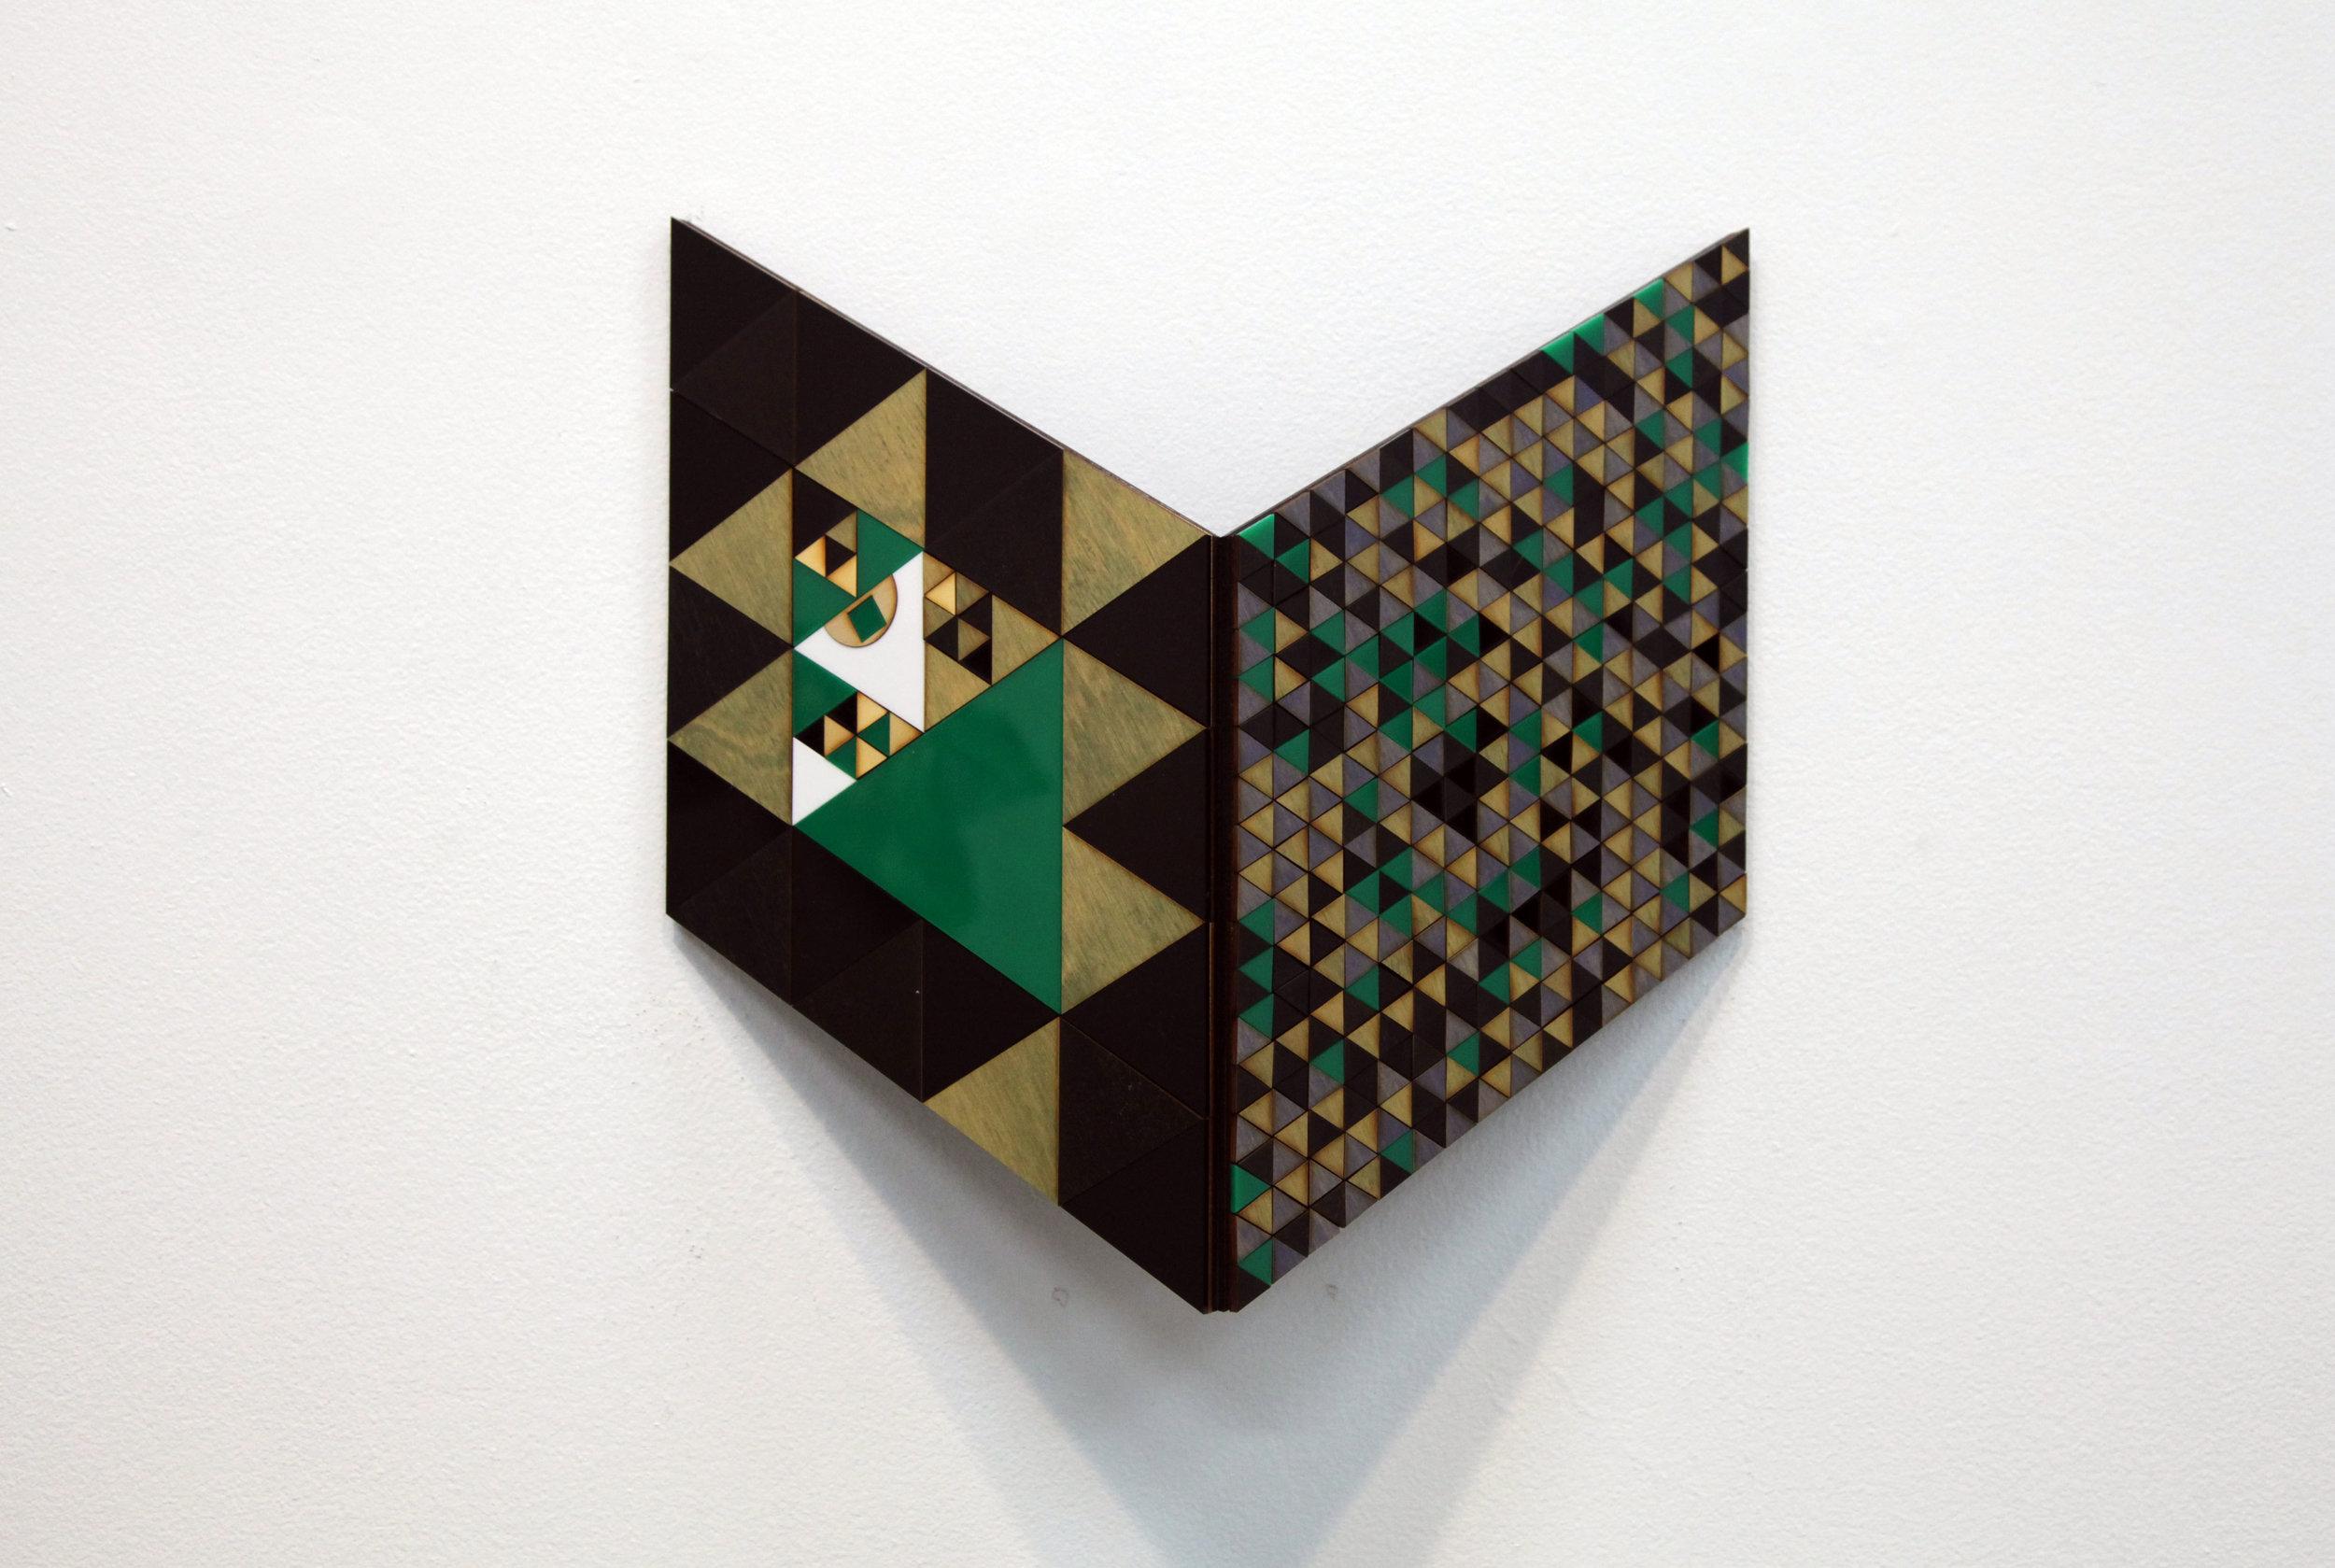 Troy Innocent, Precipice , 2015, laser cut plywood and acrylic